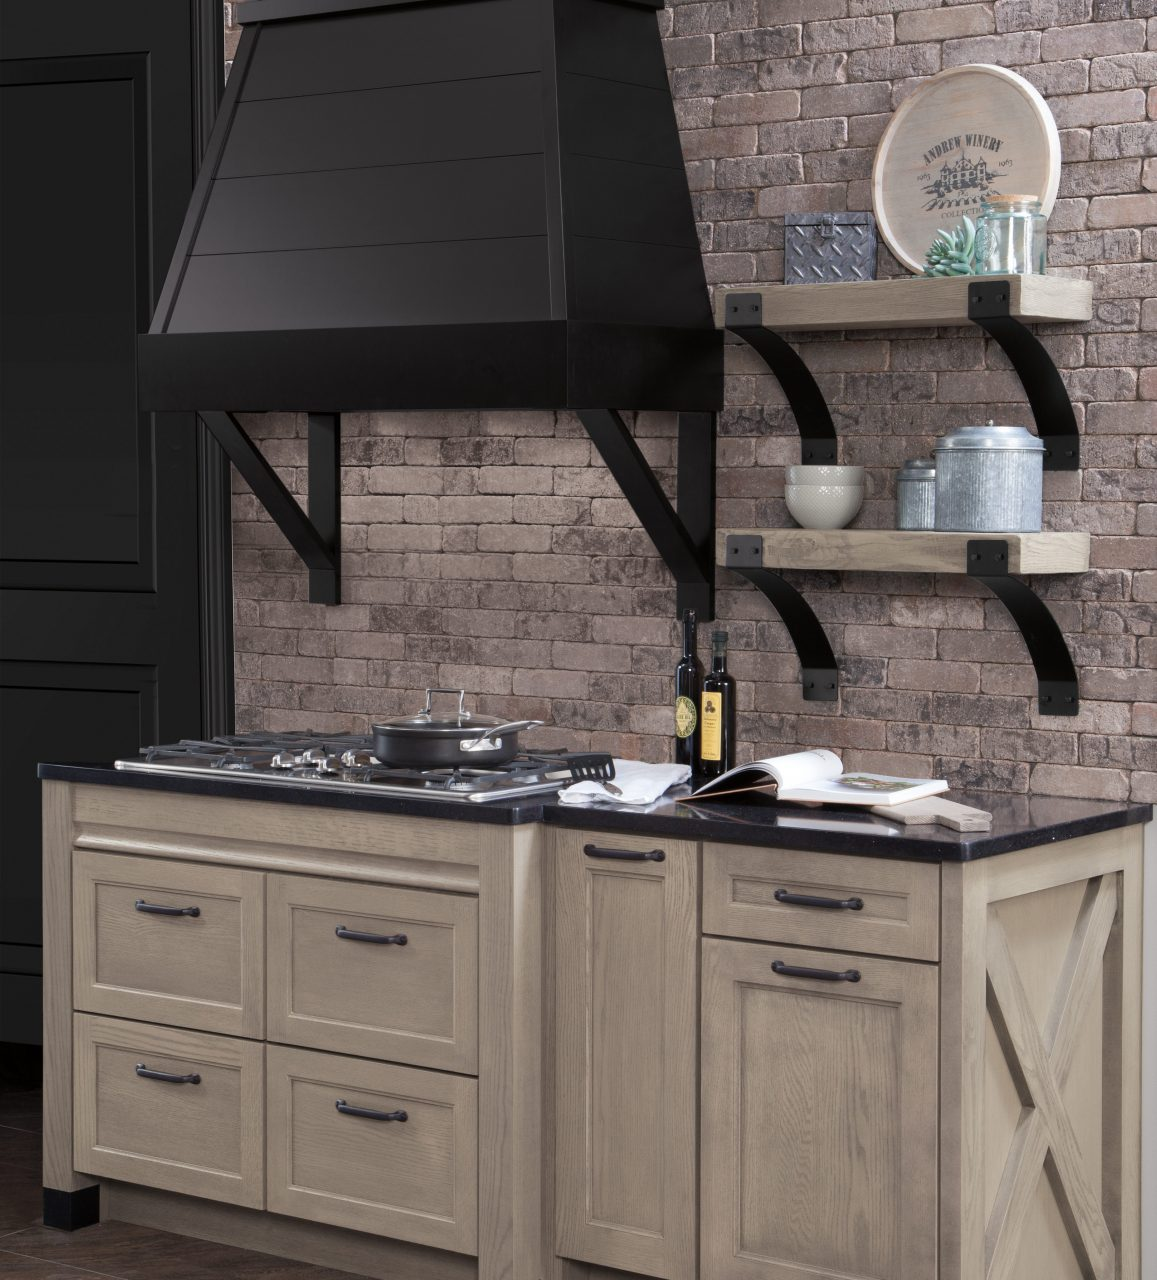 Kitchen Design NJ: Cost, Style U0026 Planning